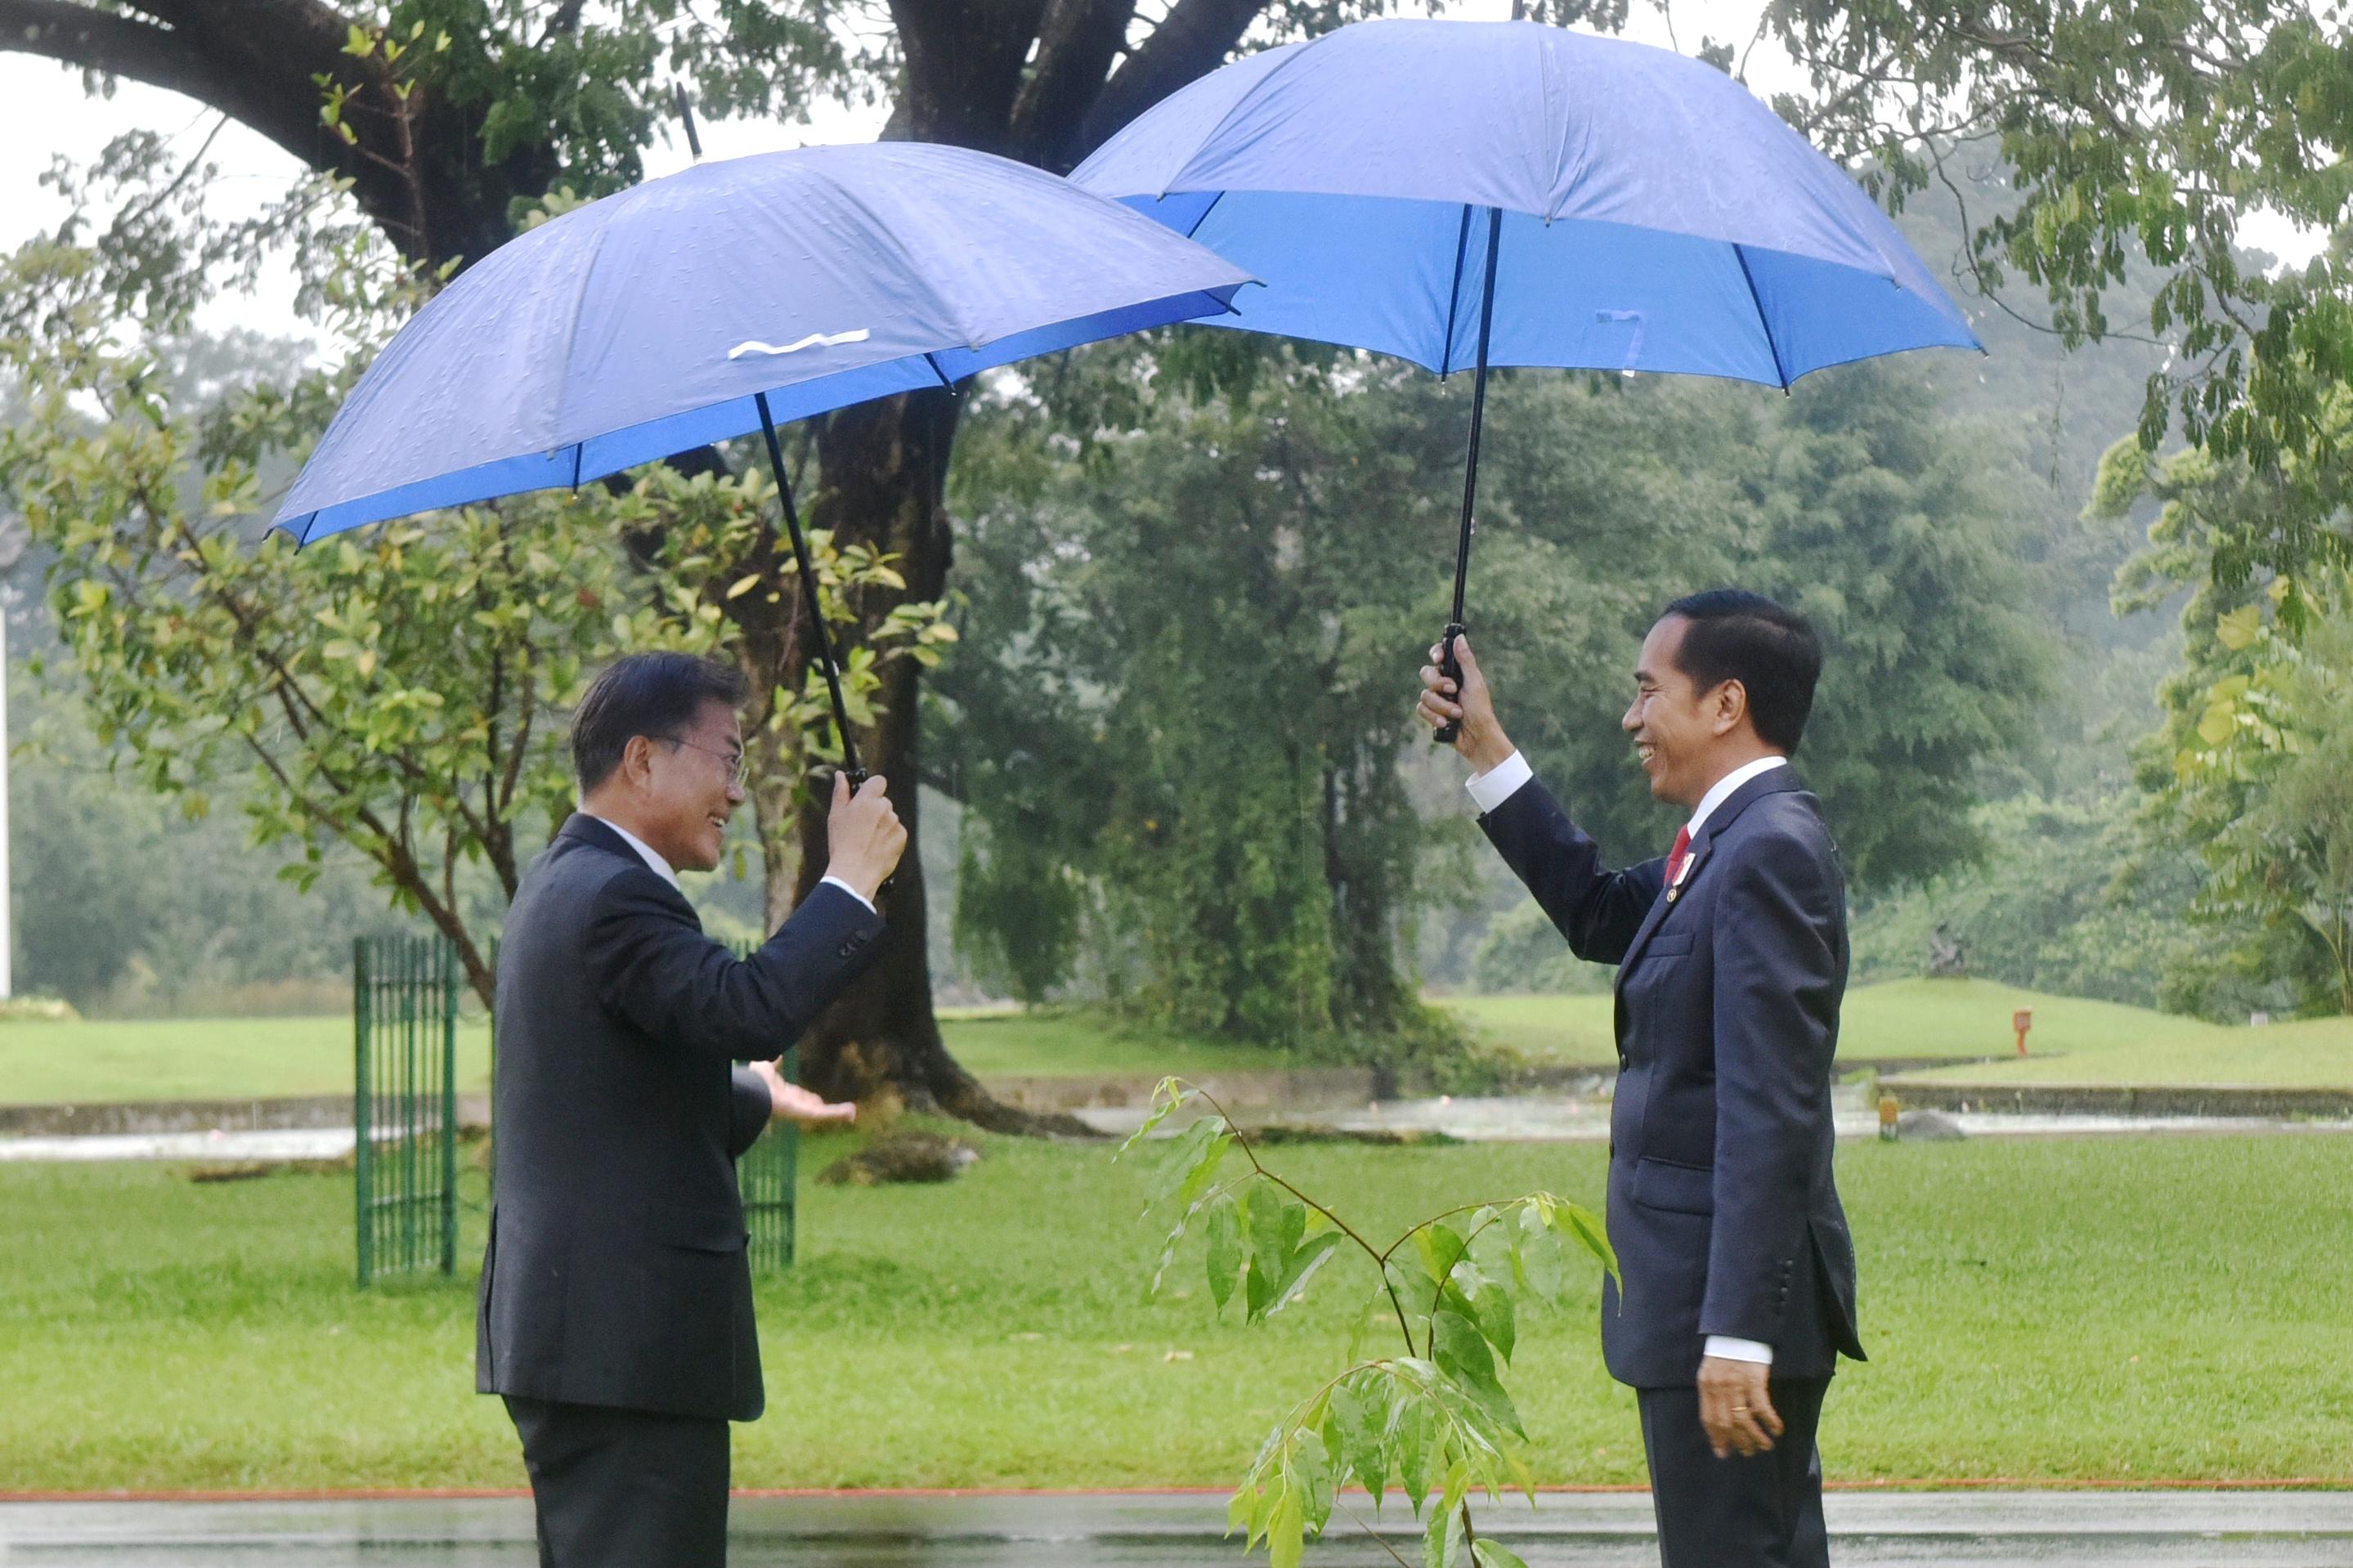 Presiden Jokowi dan Presiden Moon Jae-In usai penanaman pohon di halaman Istana Kepresidenan Bogor, Jawa Barat, Kamis (9/11) sore. (Foto: Humas/Oji).